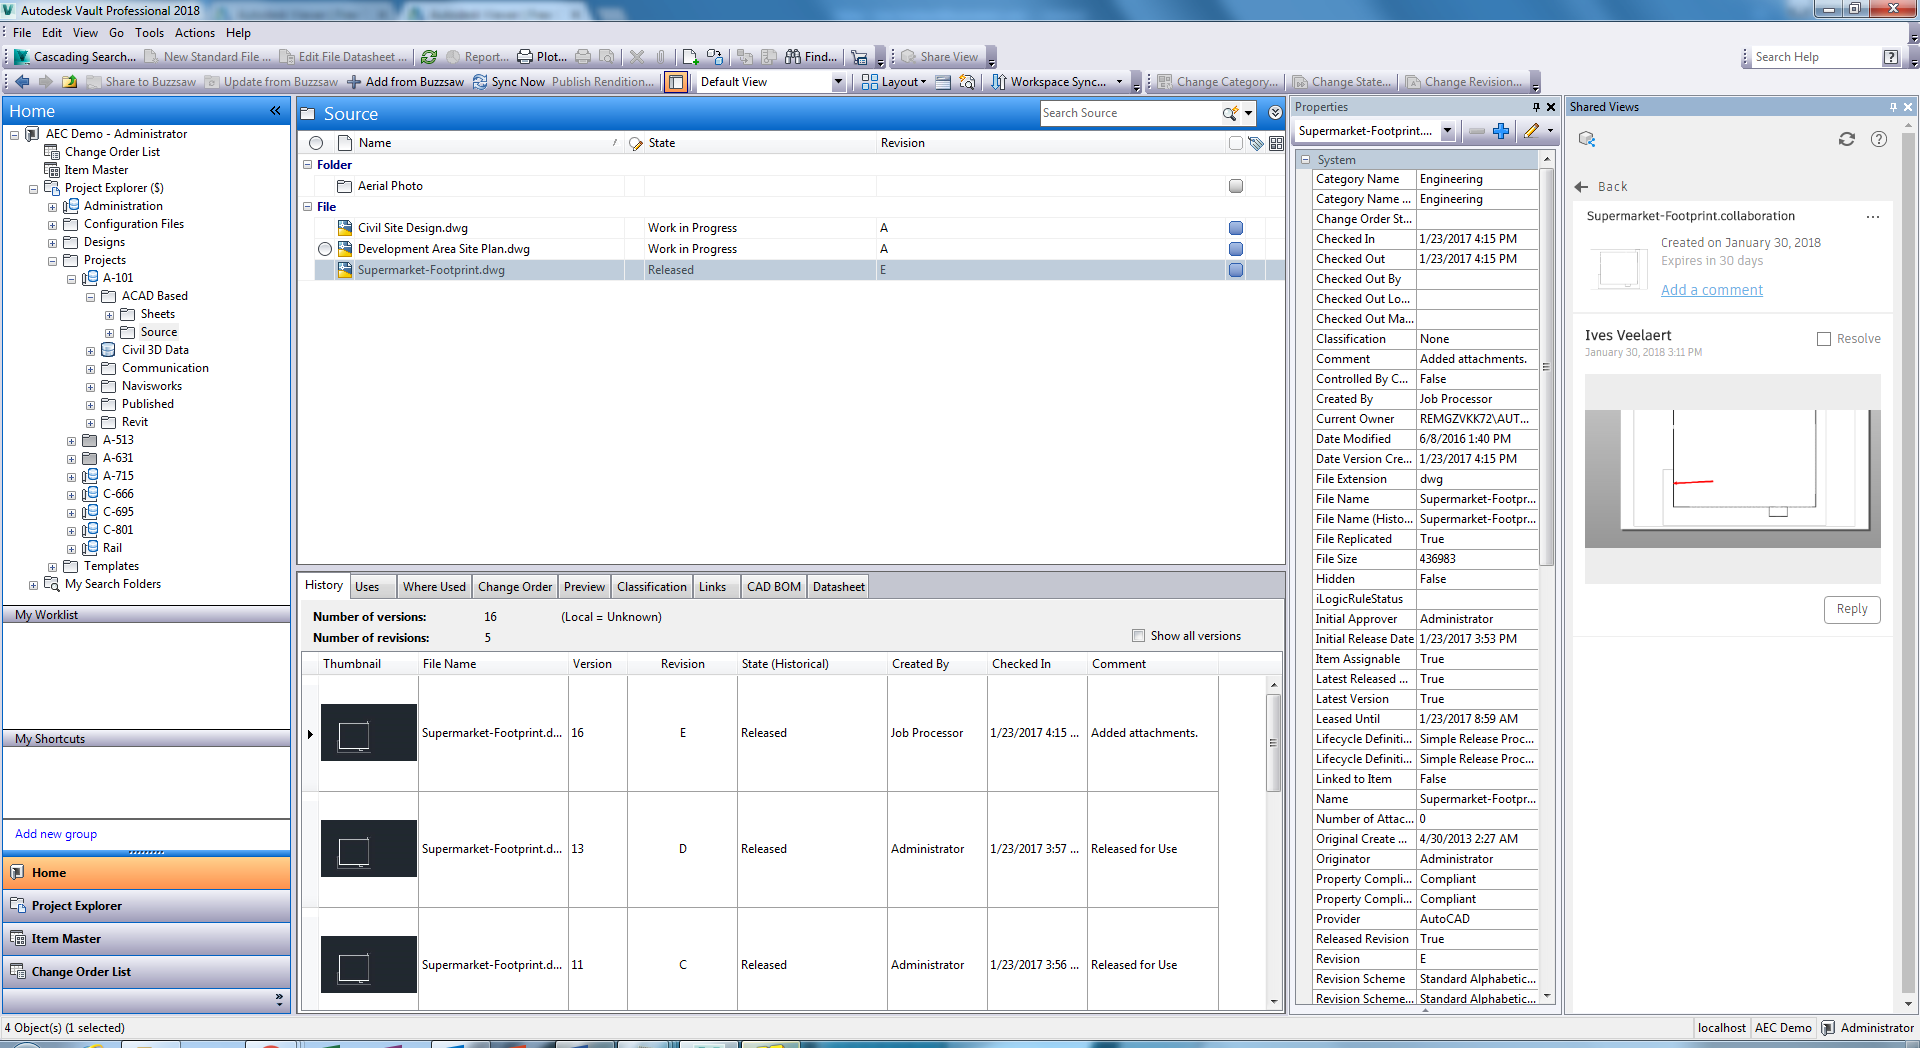 BIM Toolbox: Data Management